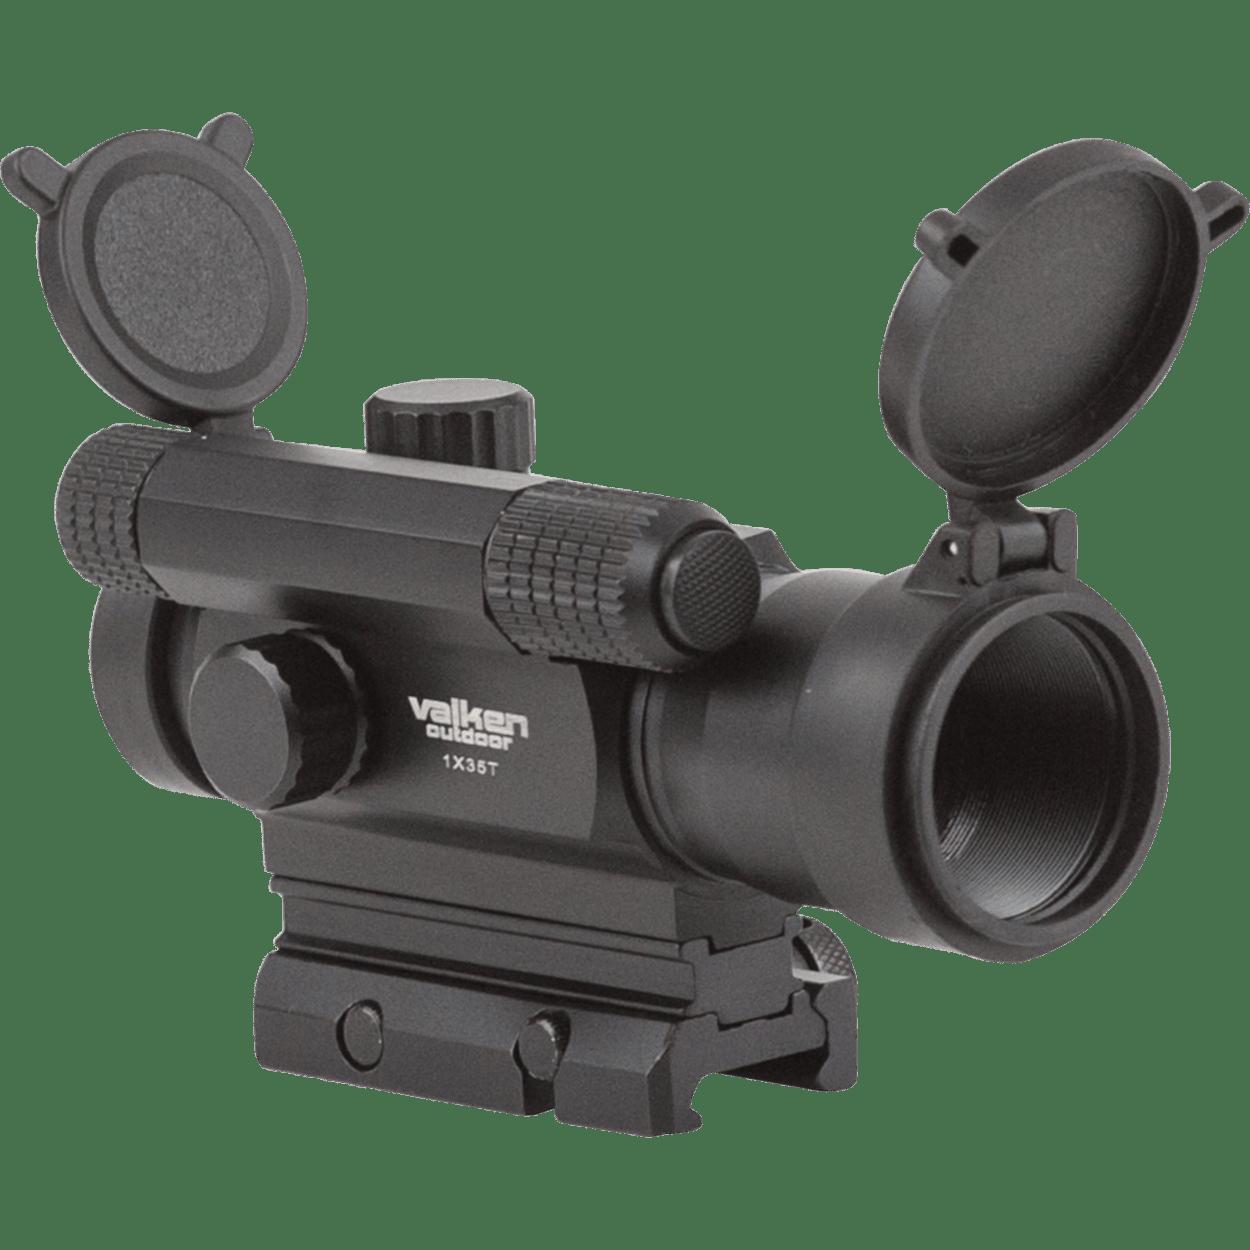 Valken Optics – V Tactical Tactical Red Dot Sight 1x35T product image